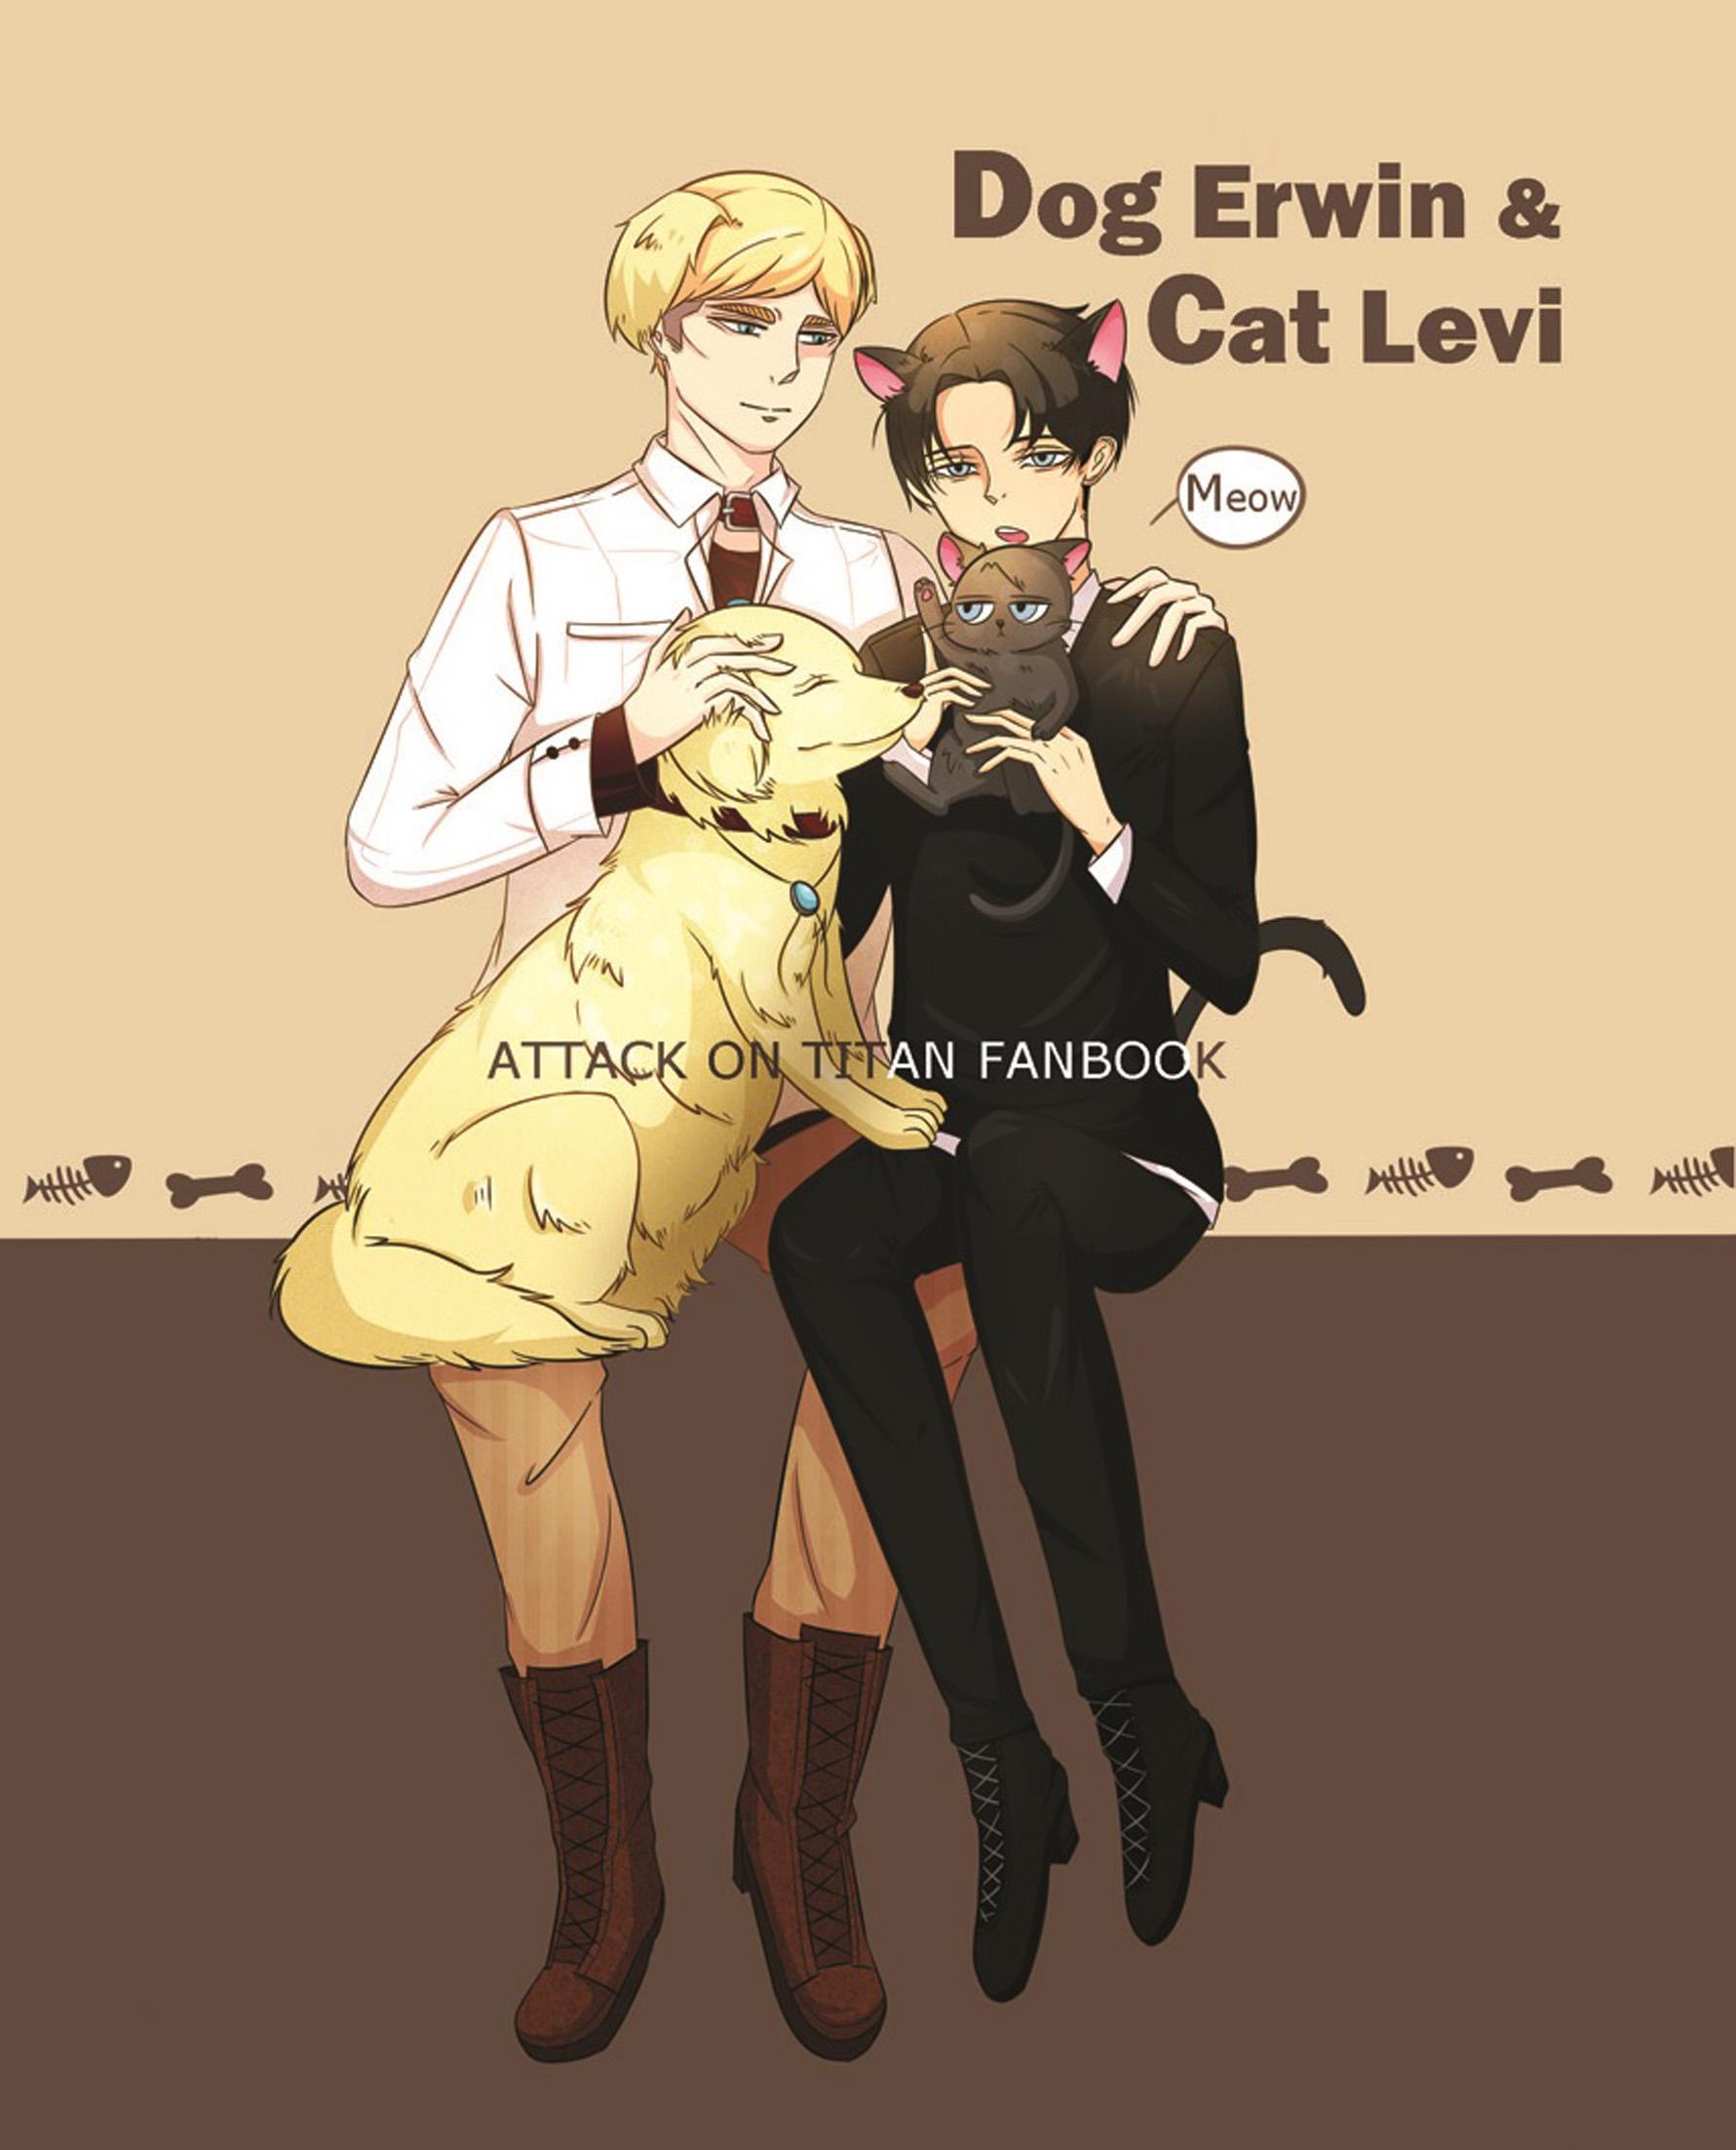 Dog Erwin & Cat Levi